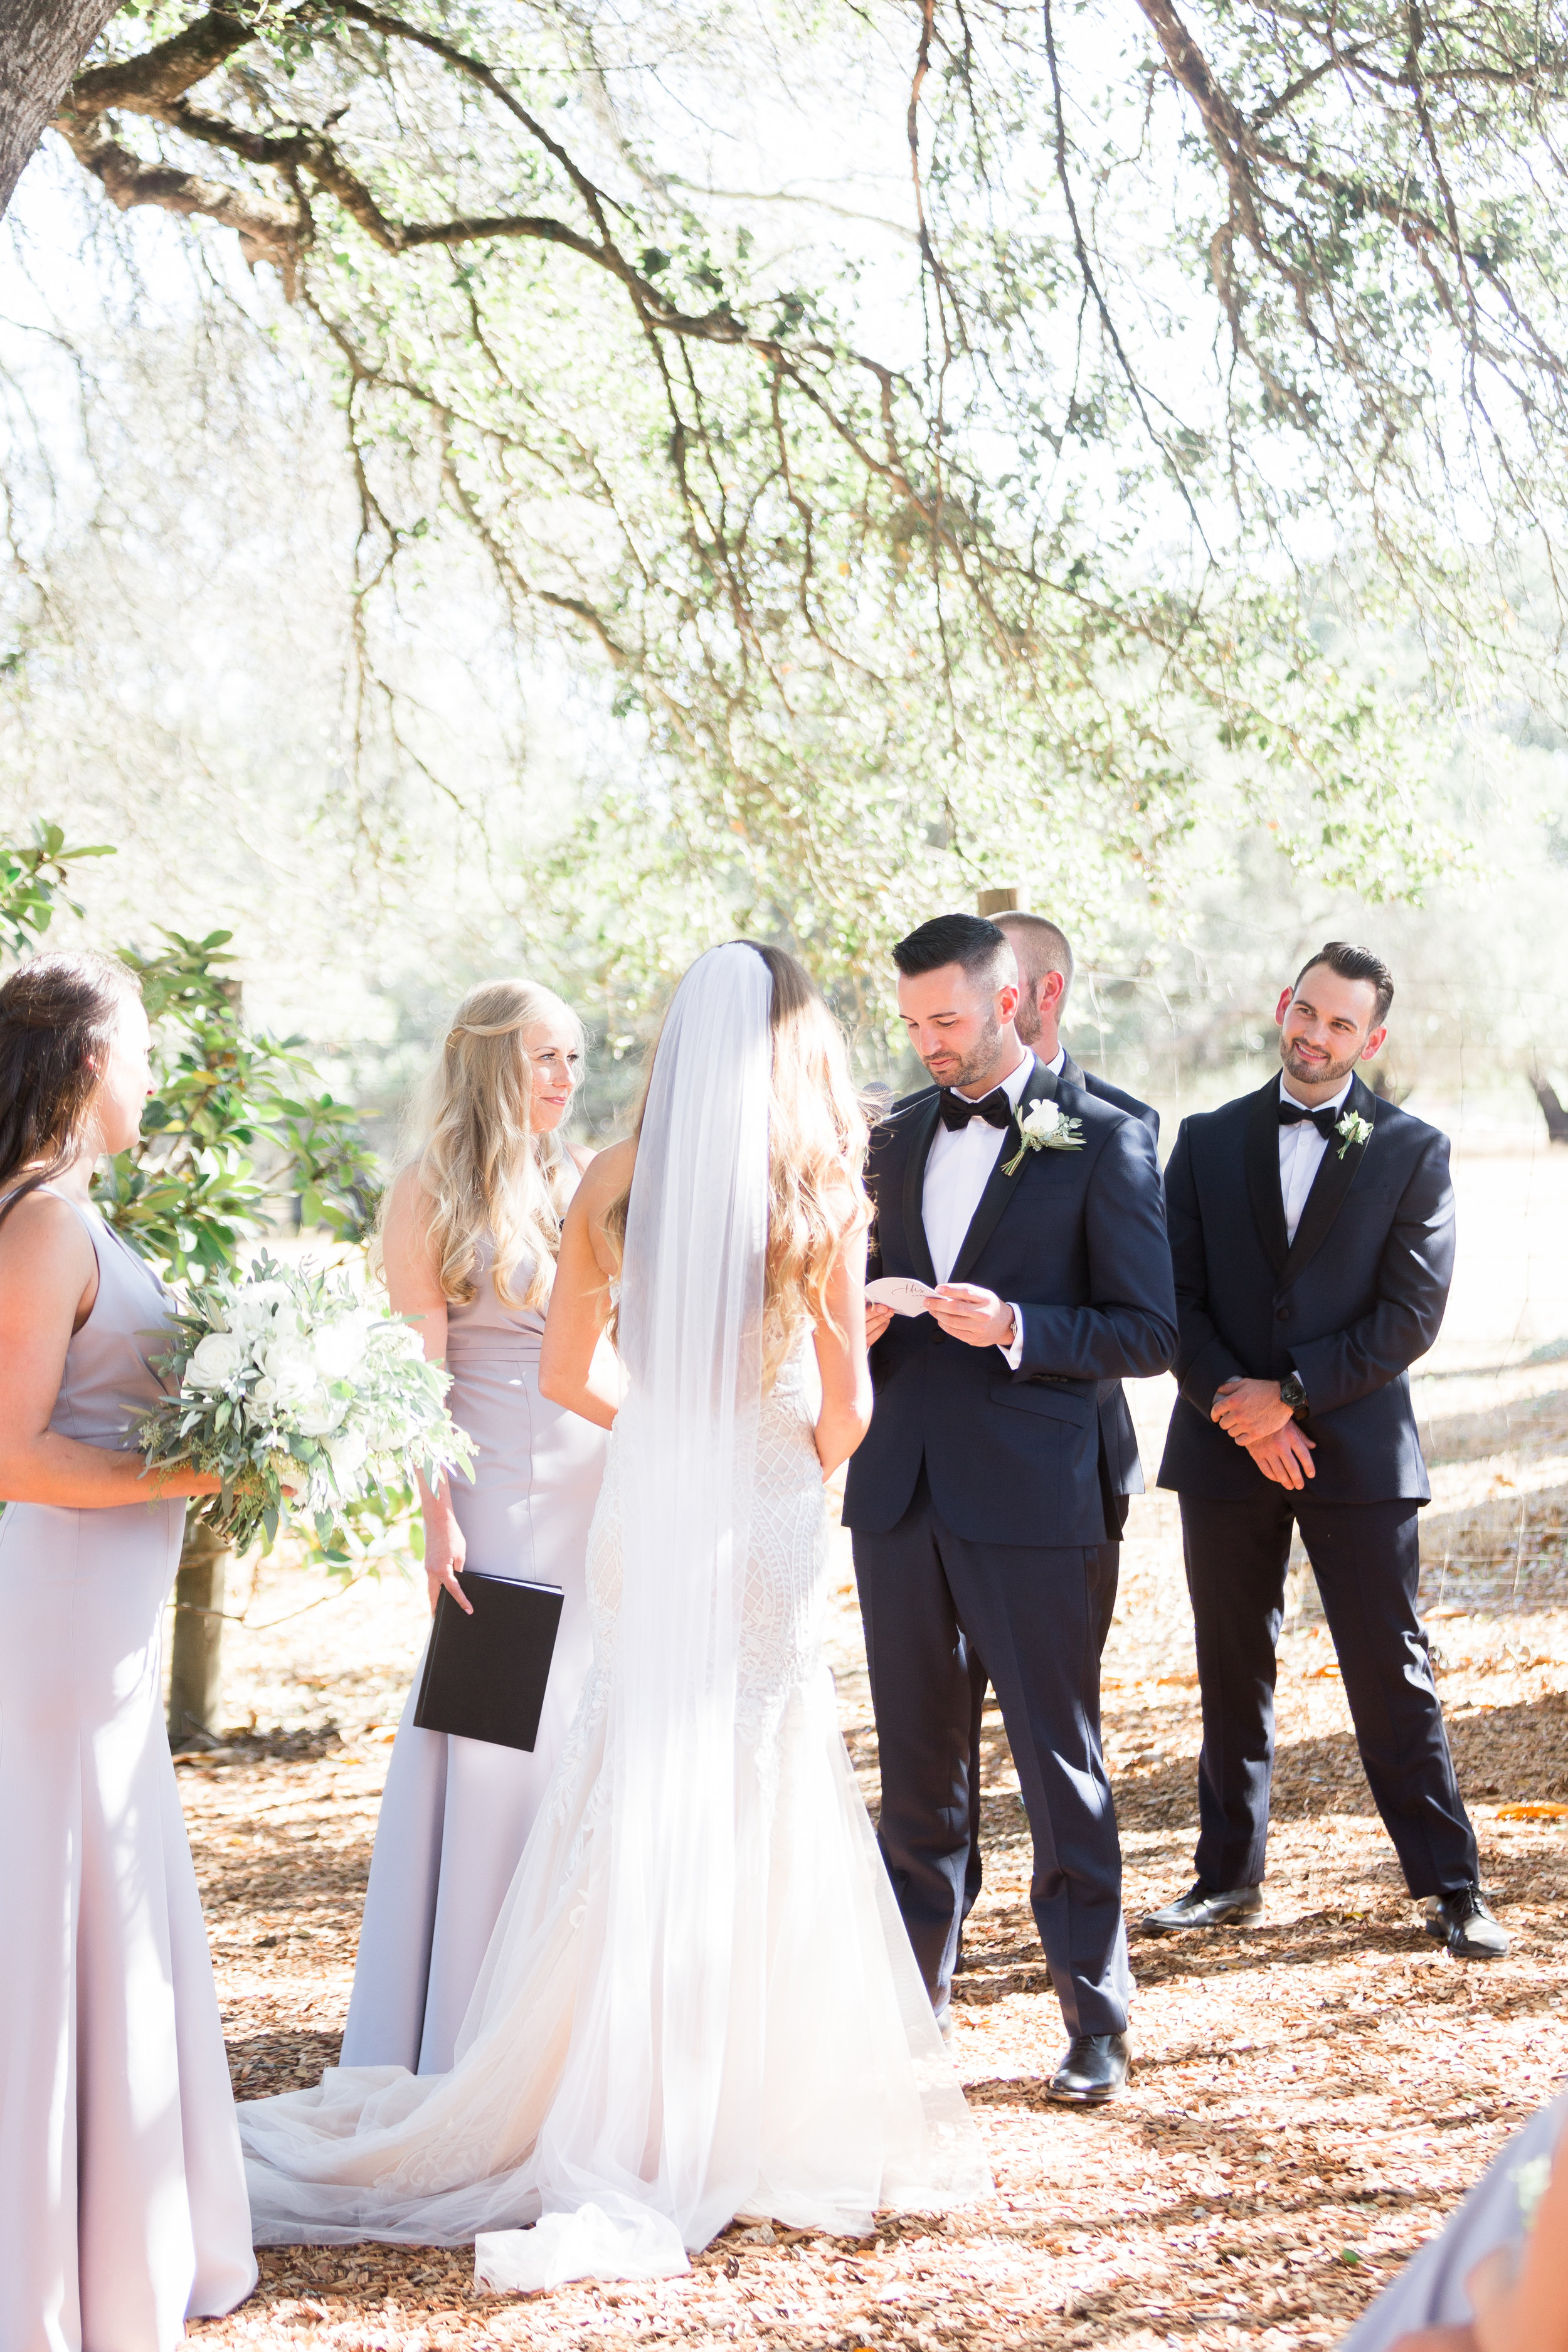 Calegari-Vineyards-Healdsburg-Wedding-Photographer (143 of 262).jpg